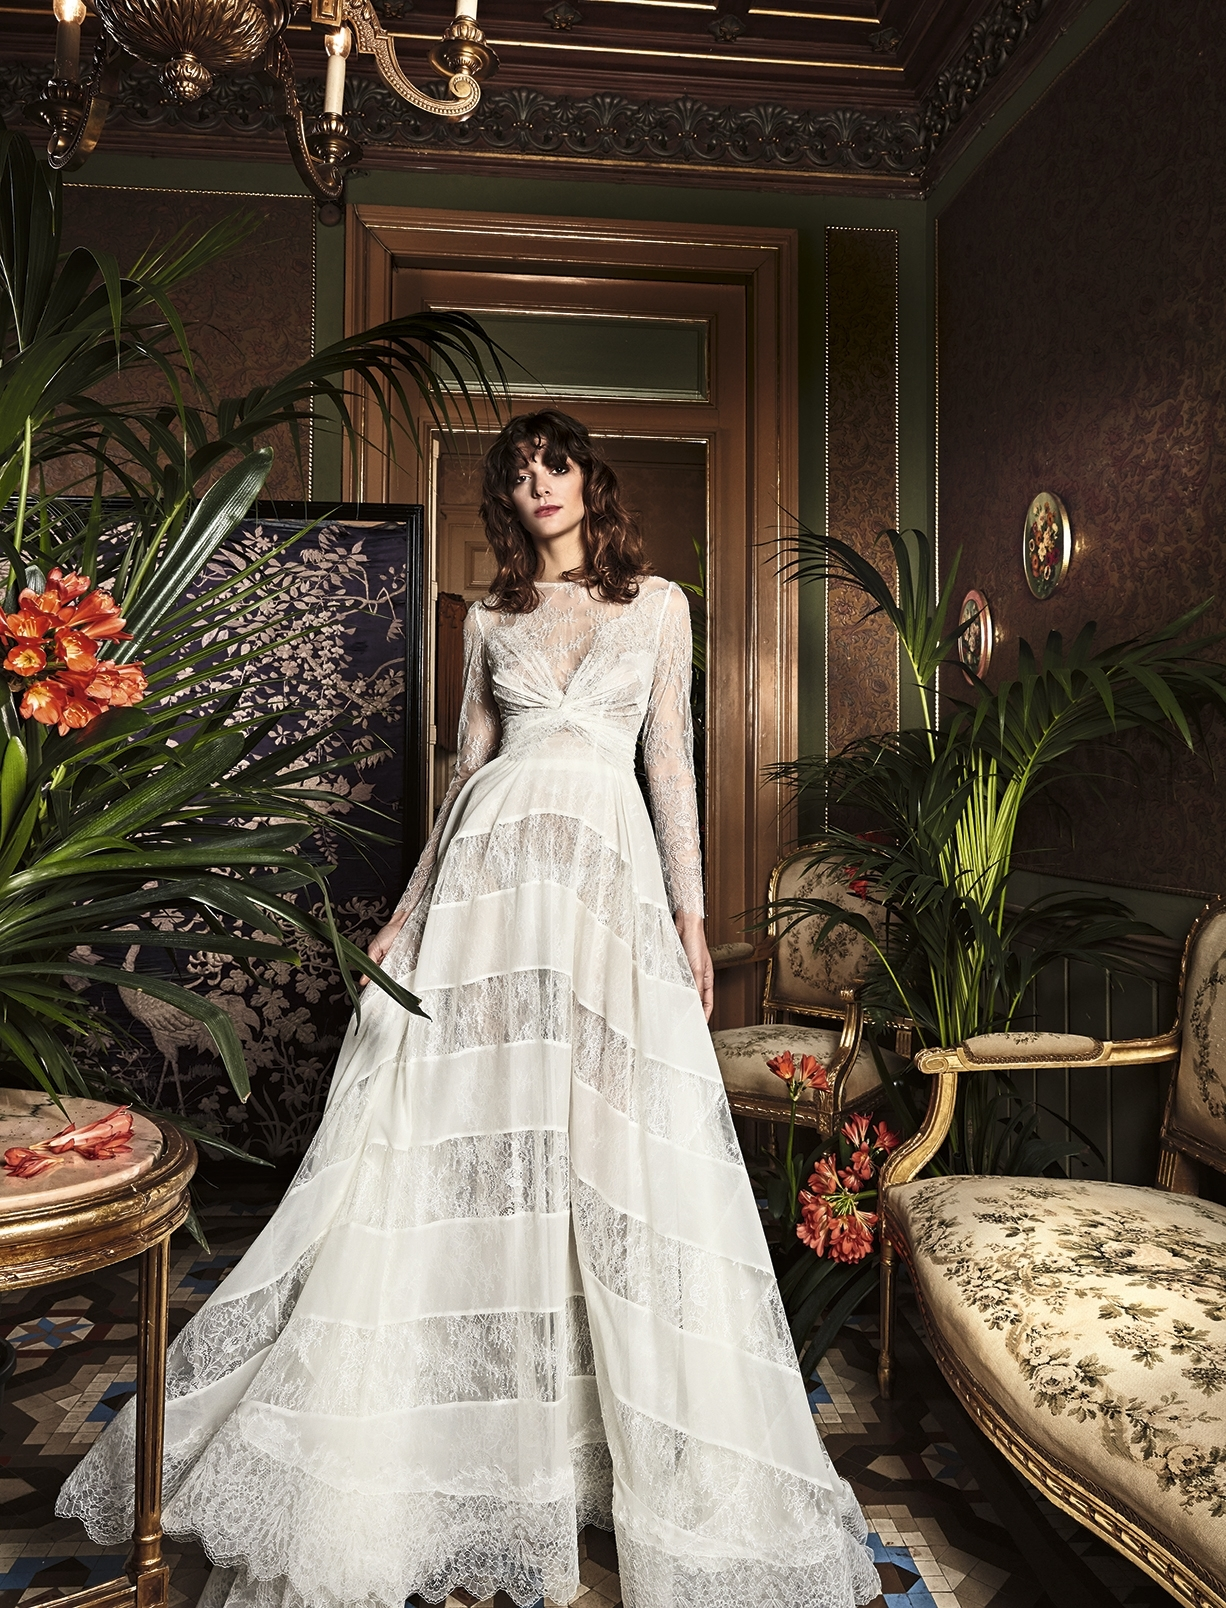 long-sleeve-wedding-dress-v-neckline-bohemian-bridal-gown-yolan-cris-yolancris-tilo1.jpg